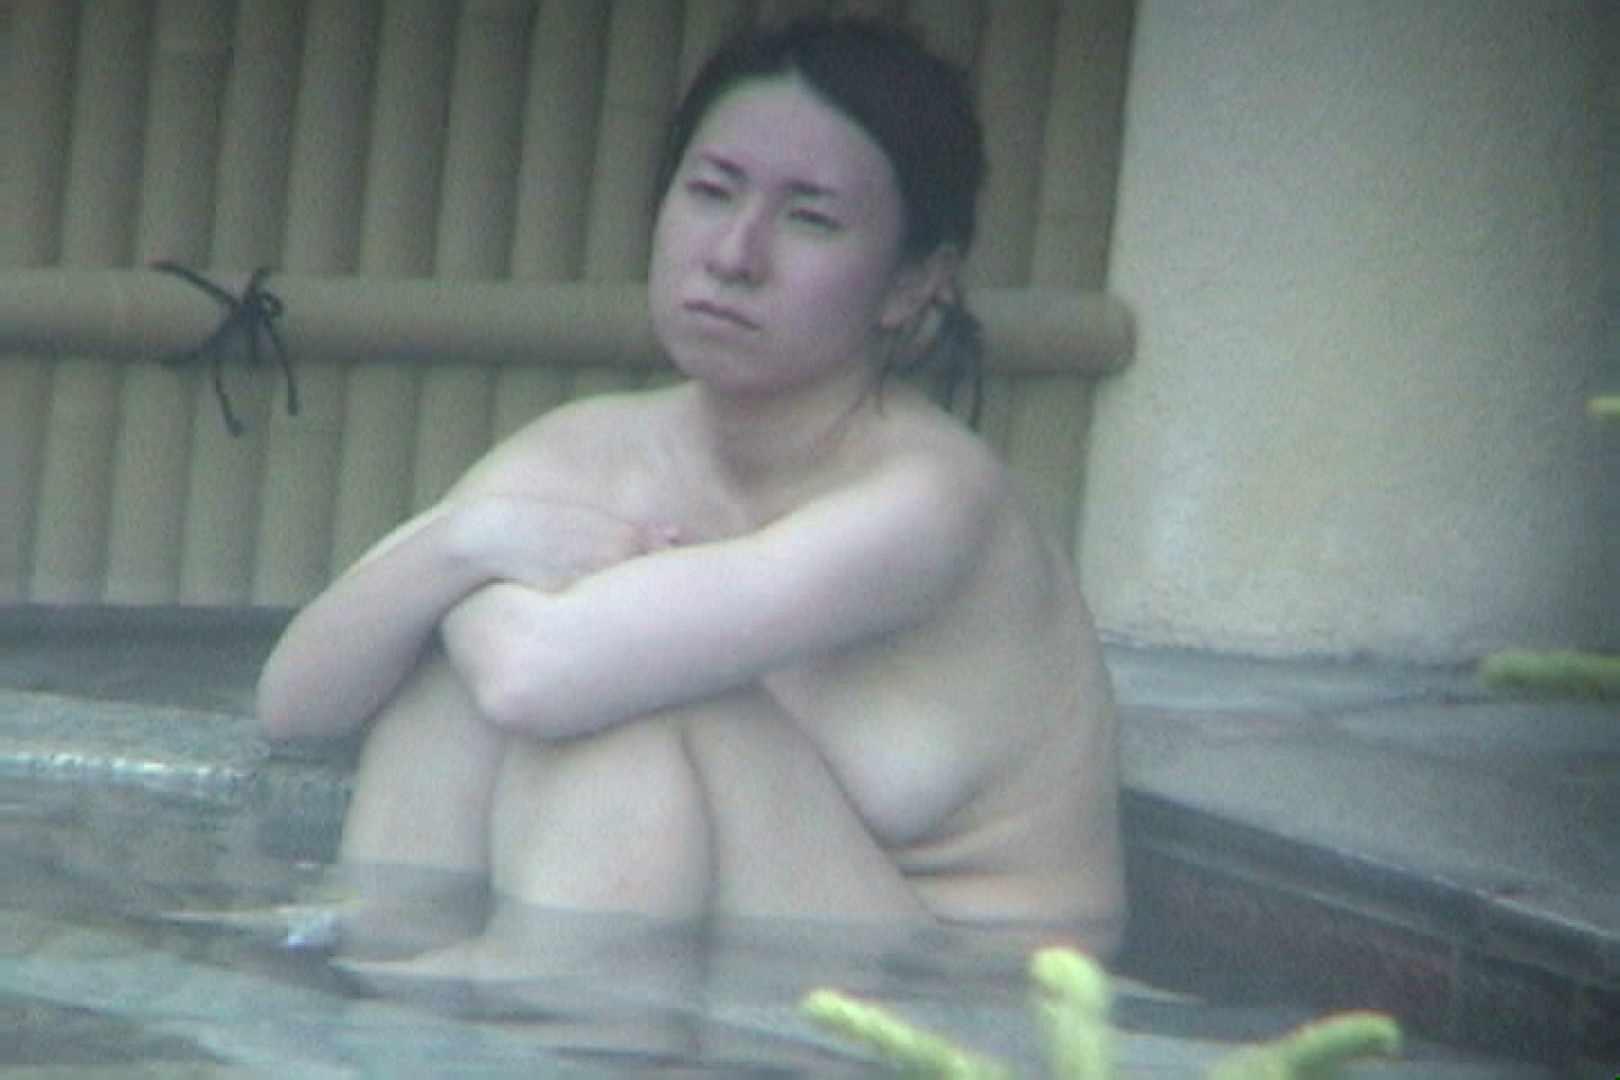 Aquaな露天風呂Vol.106 盗撮シリーズ | 露天風呂編  86PIX 17